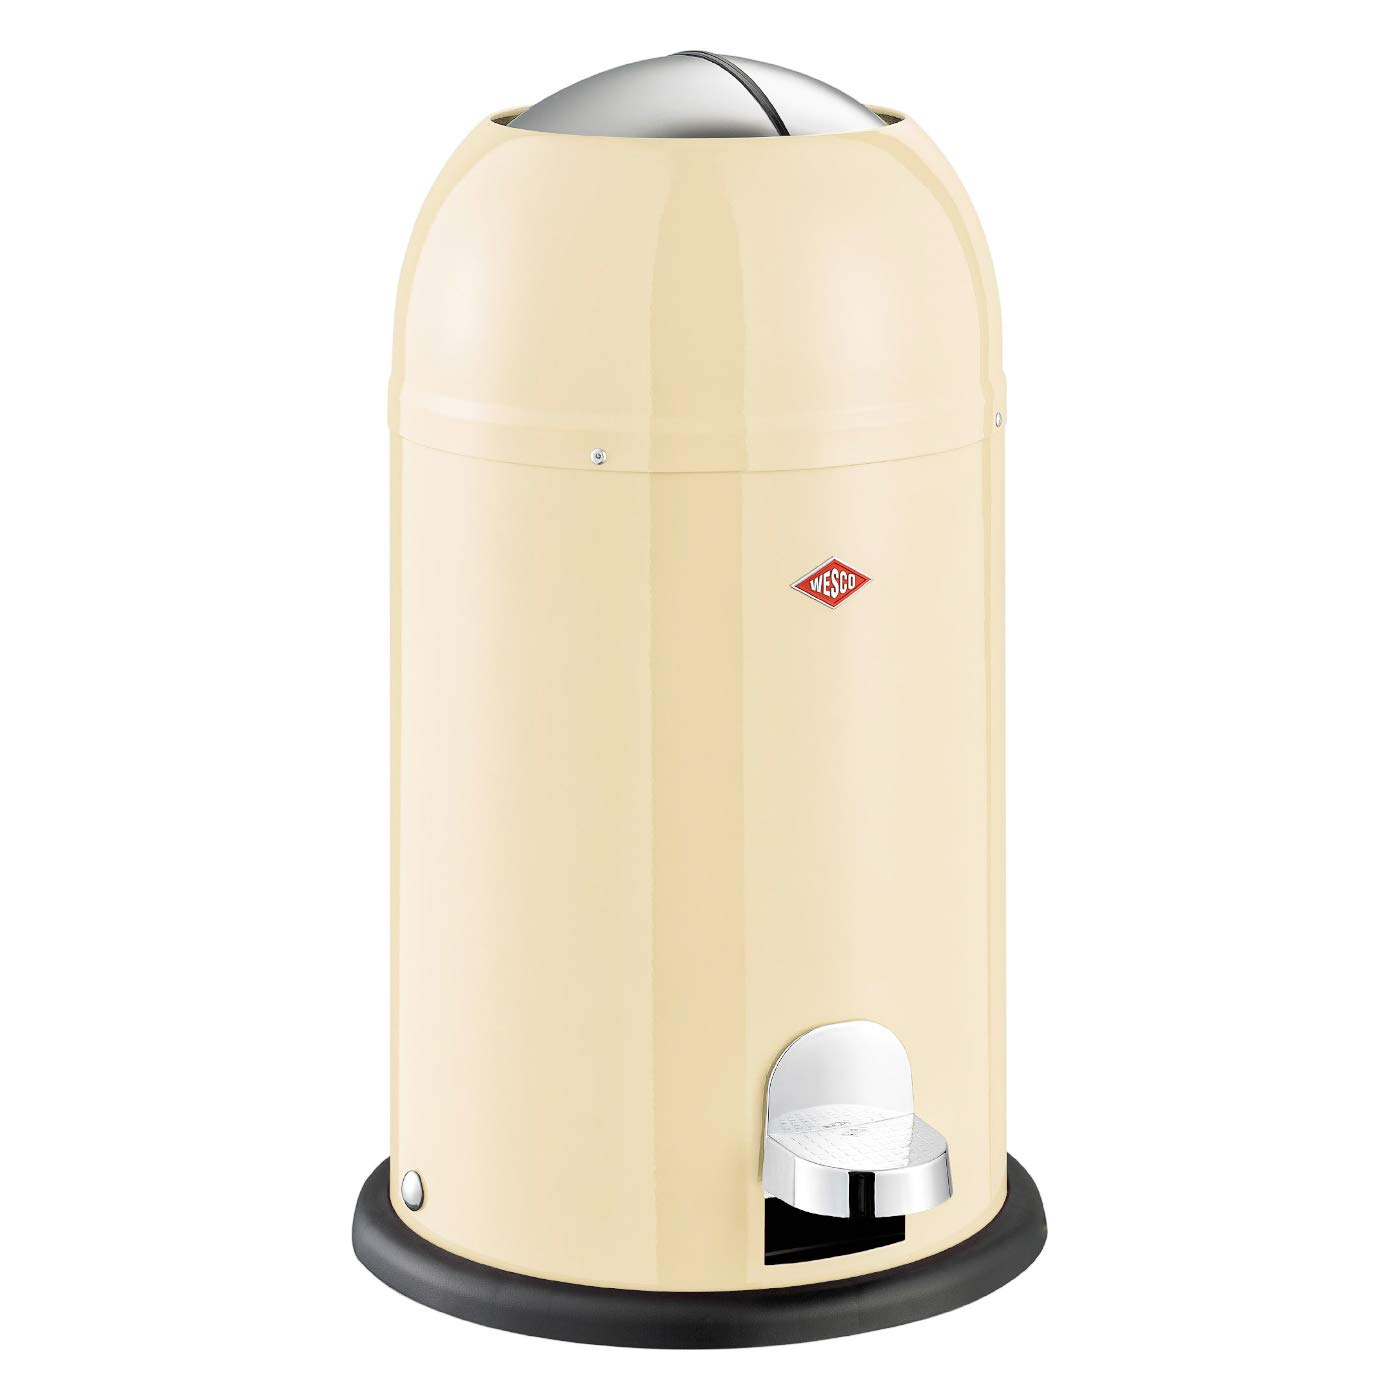 Wesco Kickmaster Junior - German Designed -  Step Trash Can, Powder Coated Steel, 4 Gallon / 15 L,  Almond